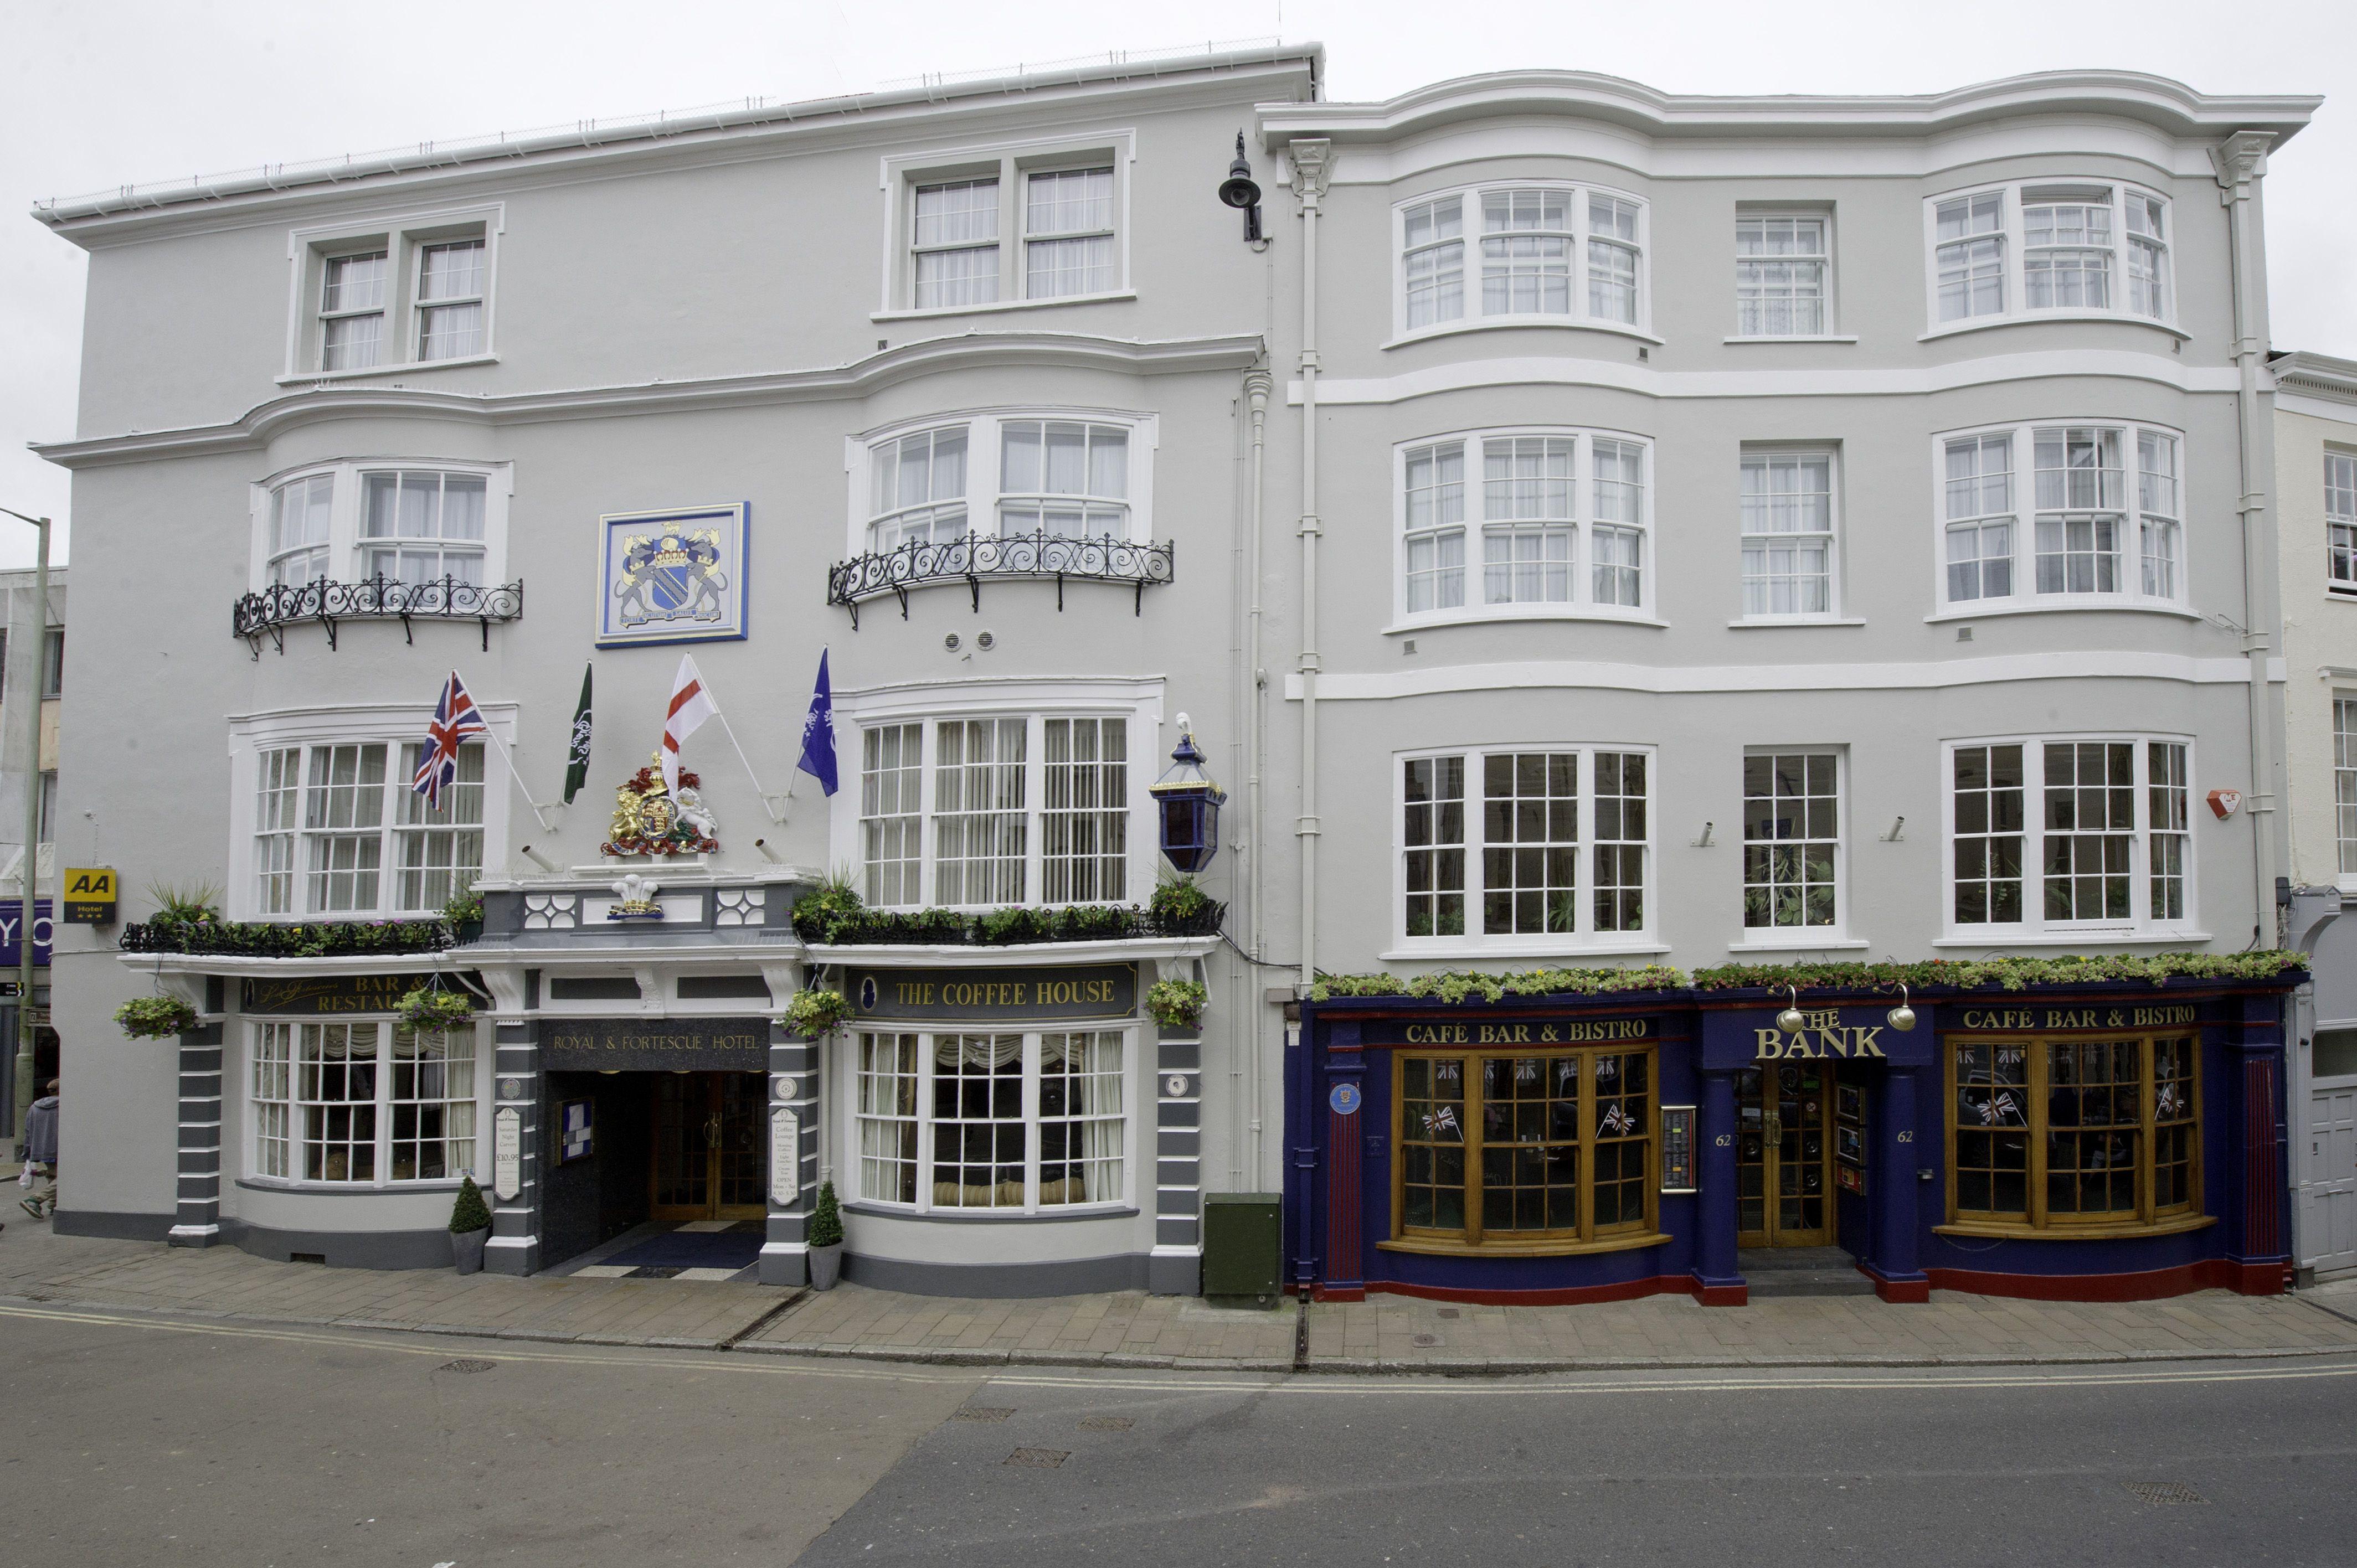 The Royal Fortescue Hotel In Barnstaple Devon Www Royalfortescue Co Uk